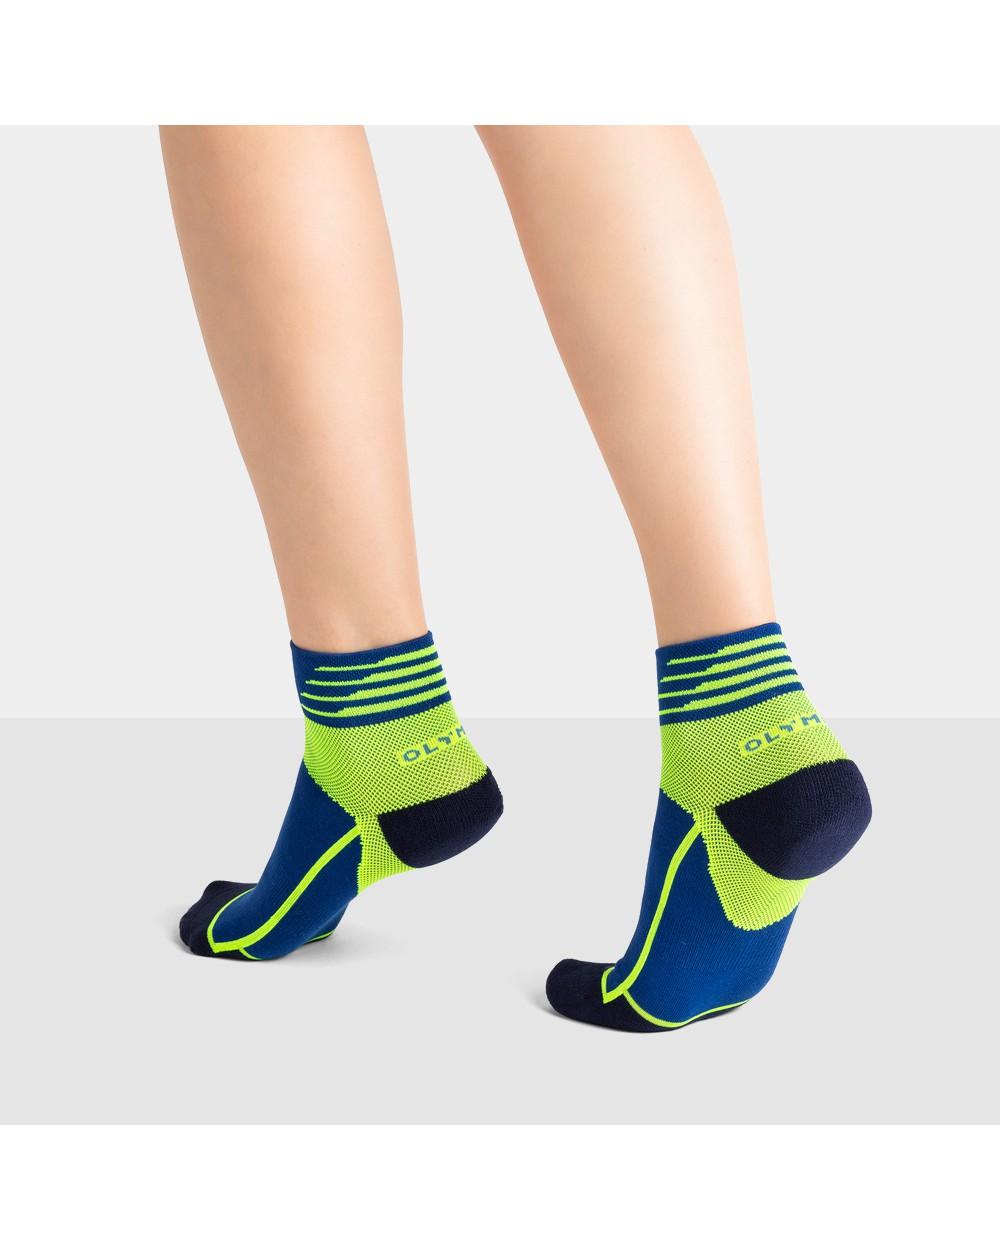 Socquettes coton sport